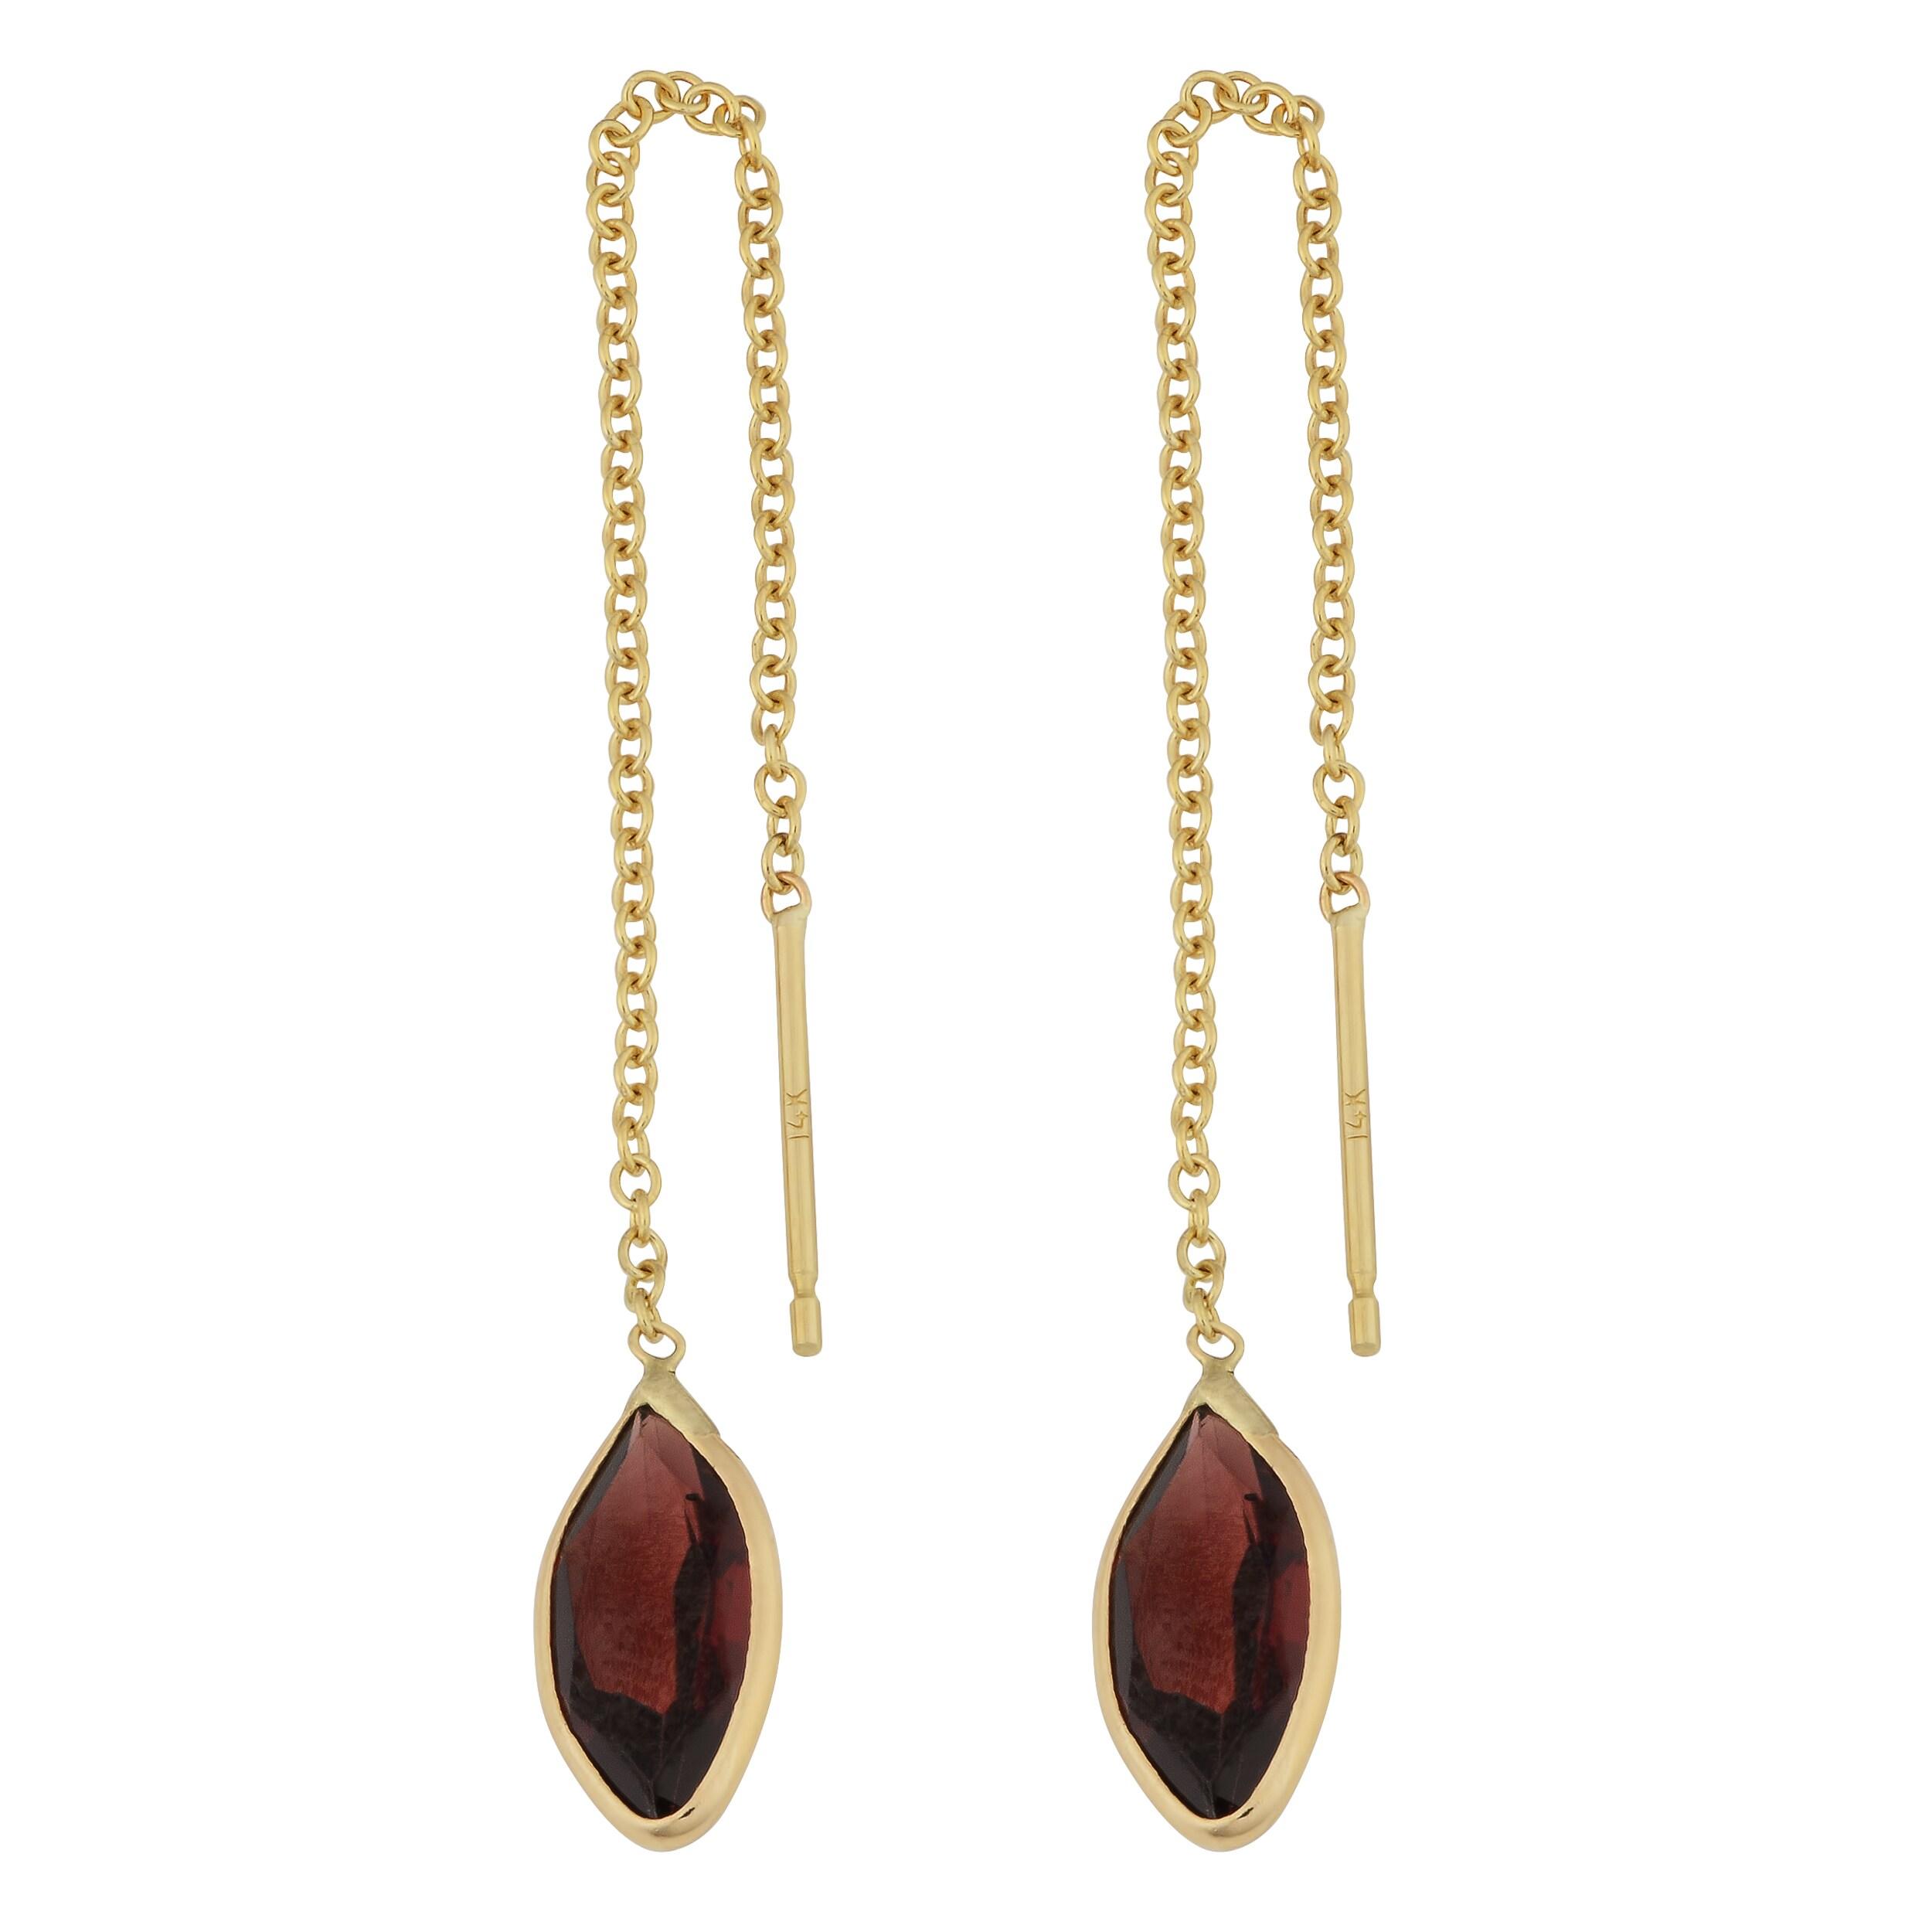 Fremada 14k Yellow Gold Marquise Garnet Threader Earrings